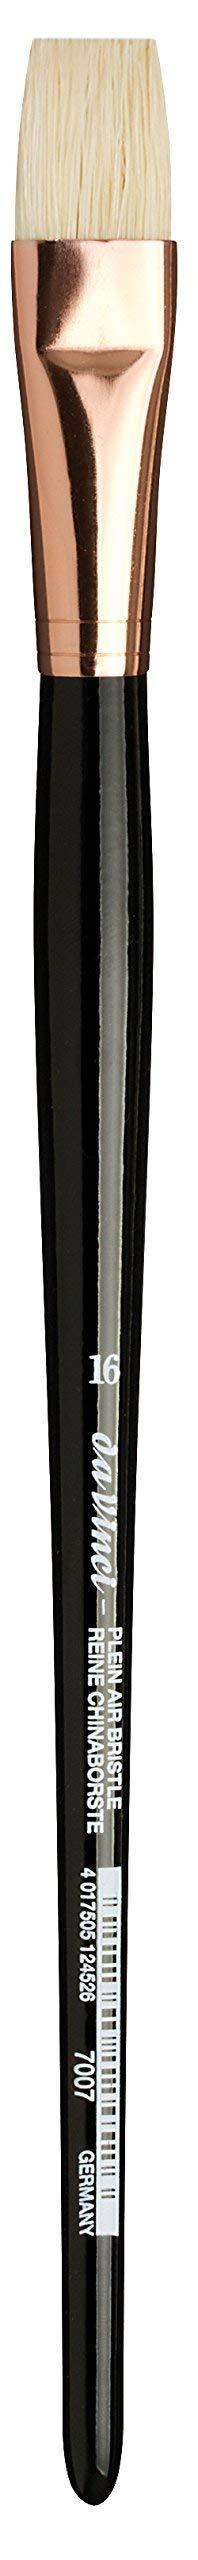 da Vinci Hog Bristle Series 7007 Plein Air Oil Painting Brush, Flat Short with Black Lacquered Handle and Copper Ferrule, Size 16 (7007-16) by da Vinci Brushes